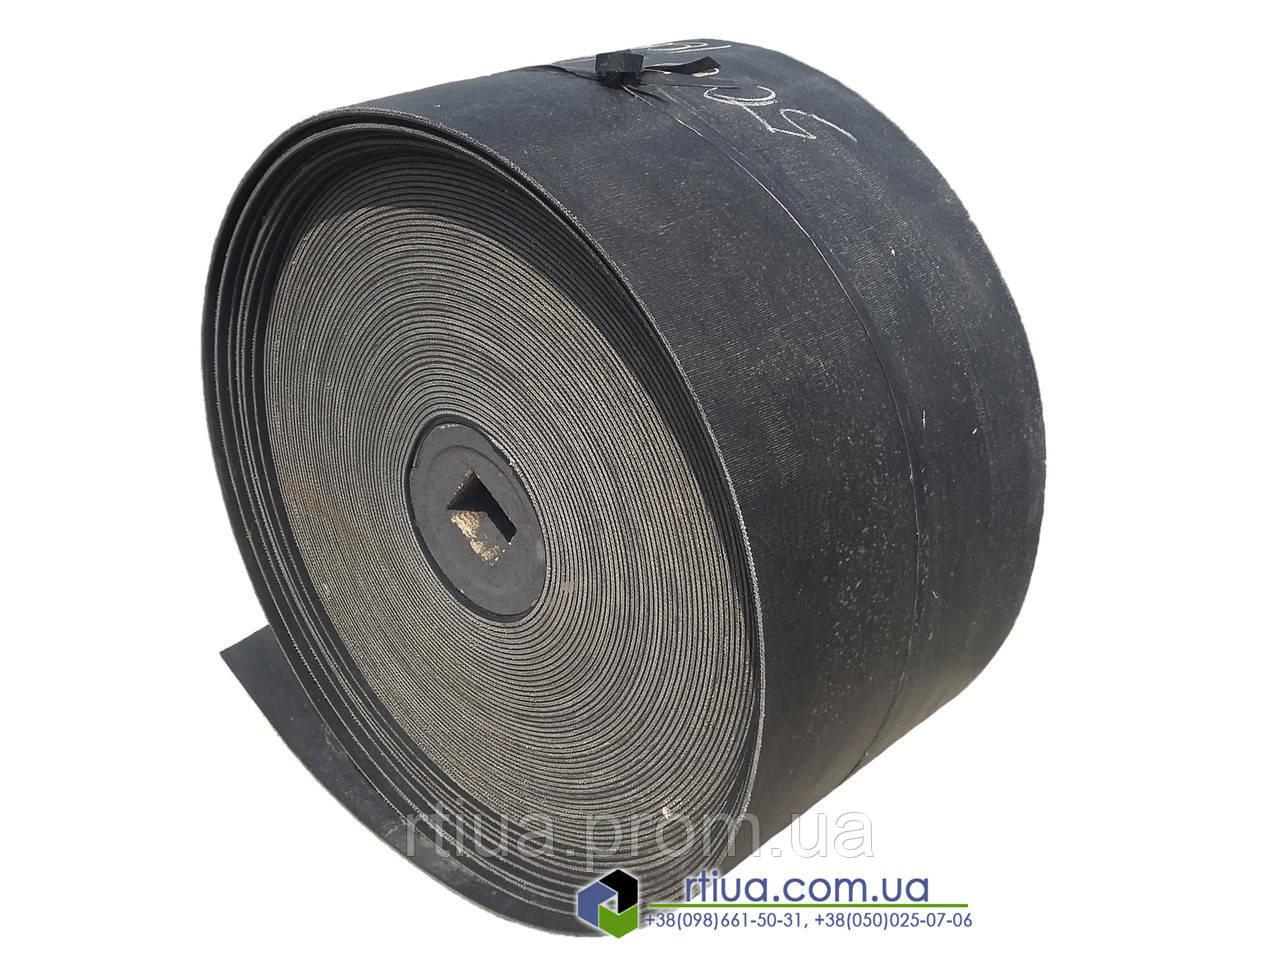 Конвейерная лента 500х5 мм